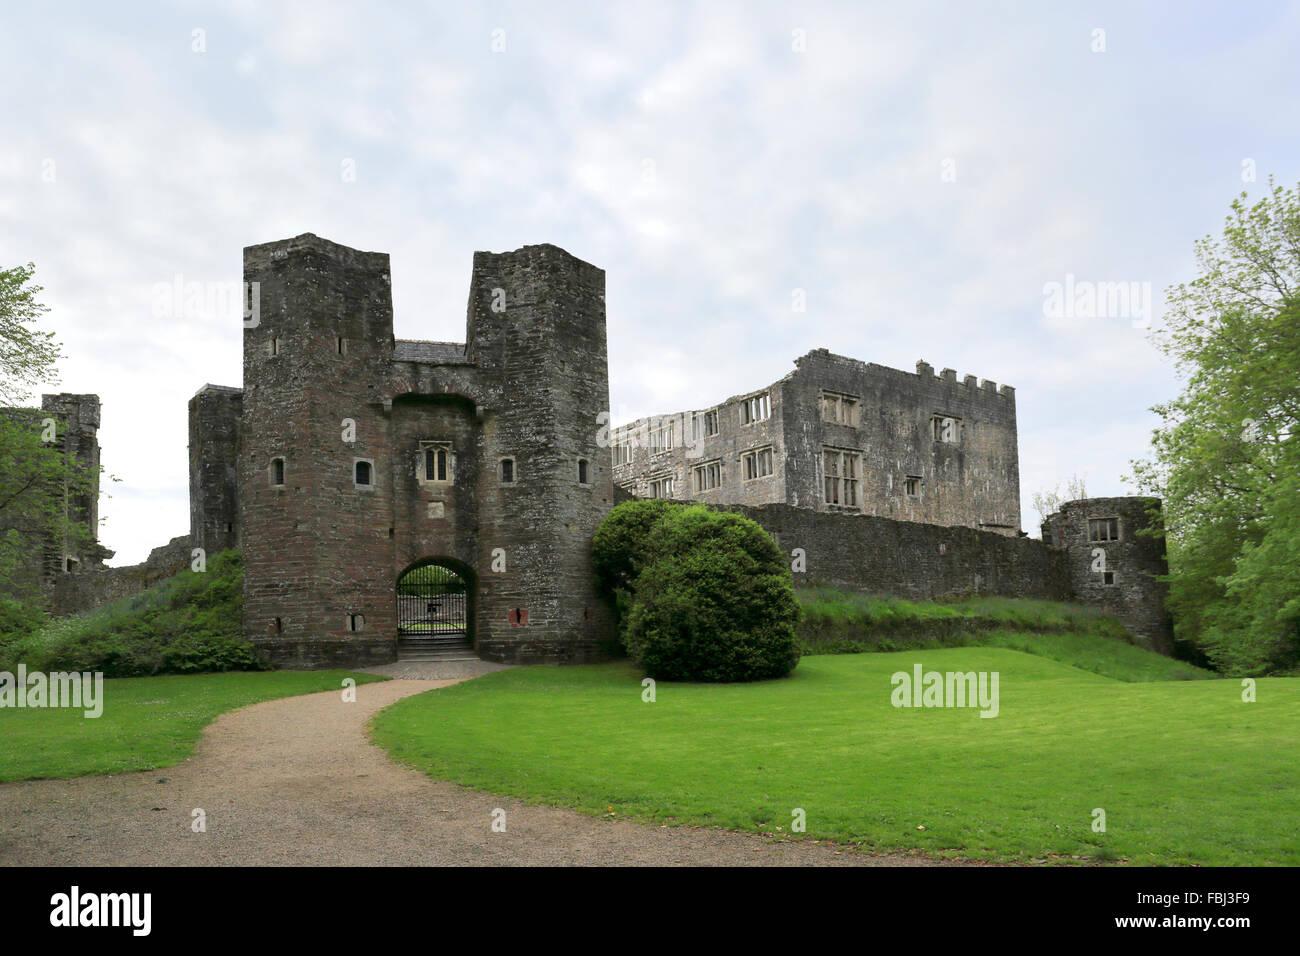 Berry Pomeroy ruined castle, near Totnes Market town, Devon County, England, UK - Stock Image